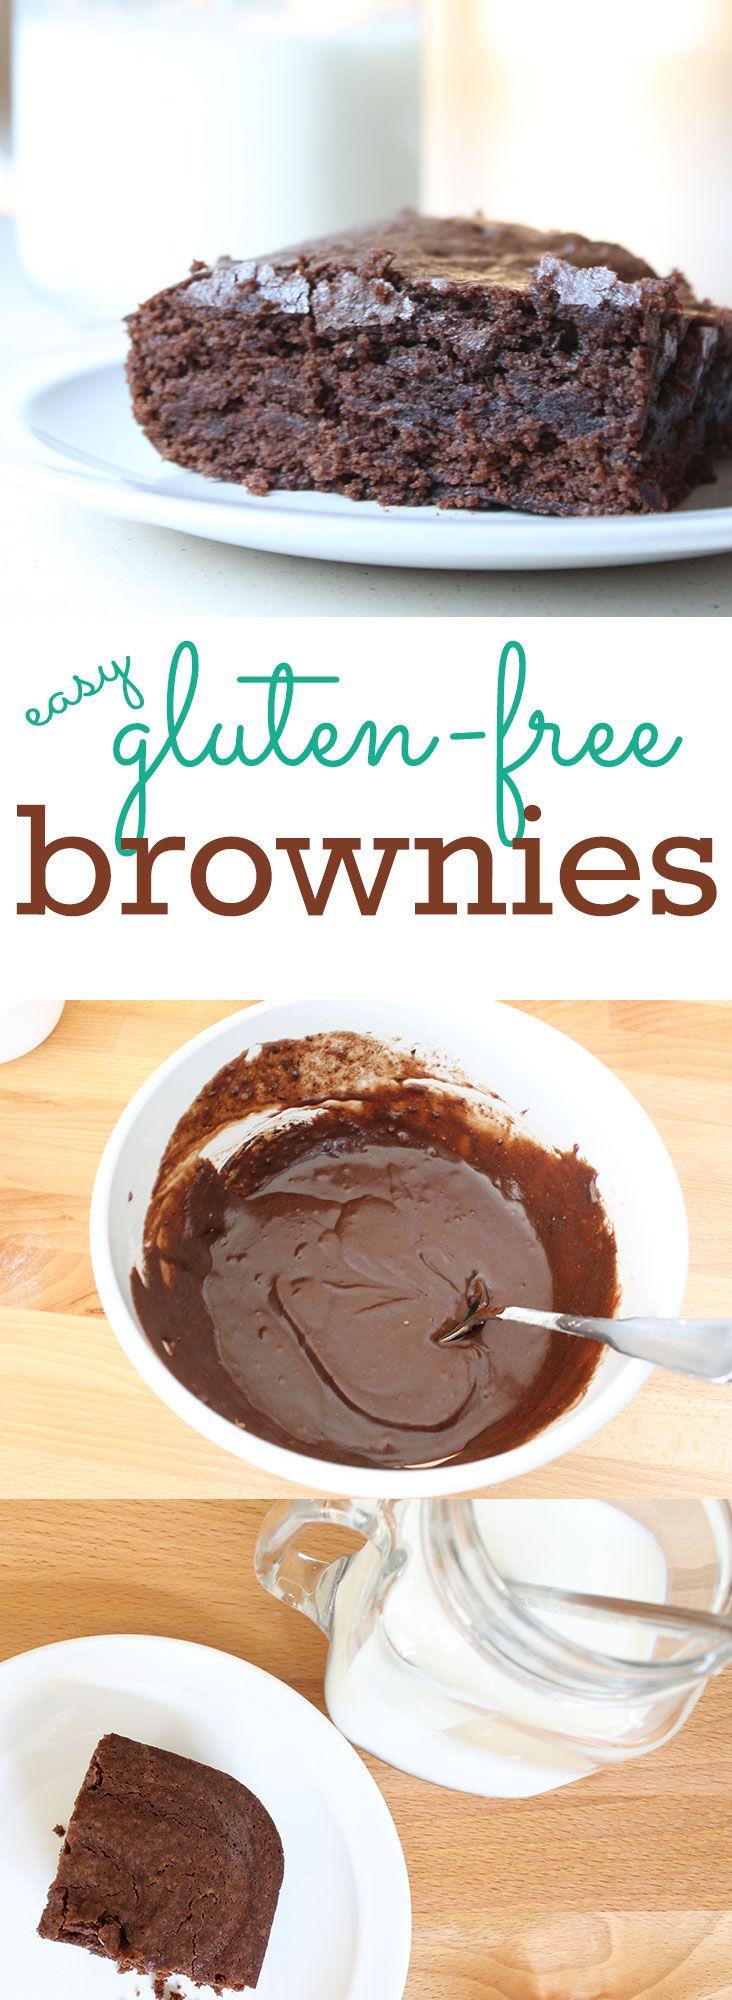 Easy Gluten Free Brownies (egg-free, nut-free too!)